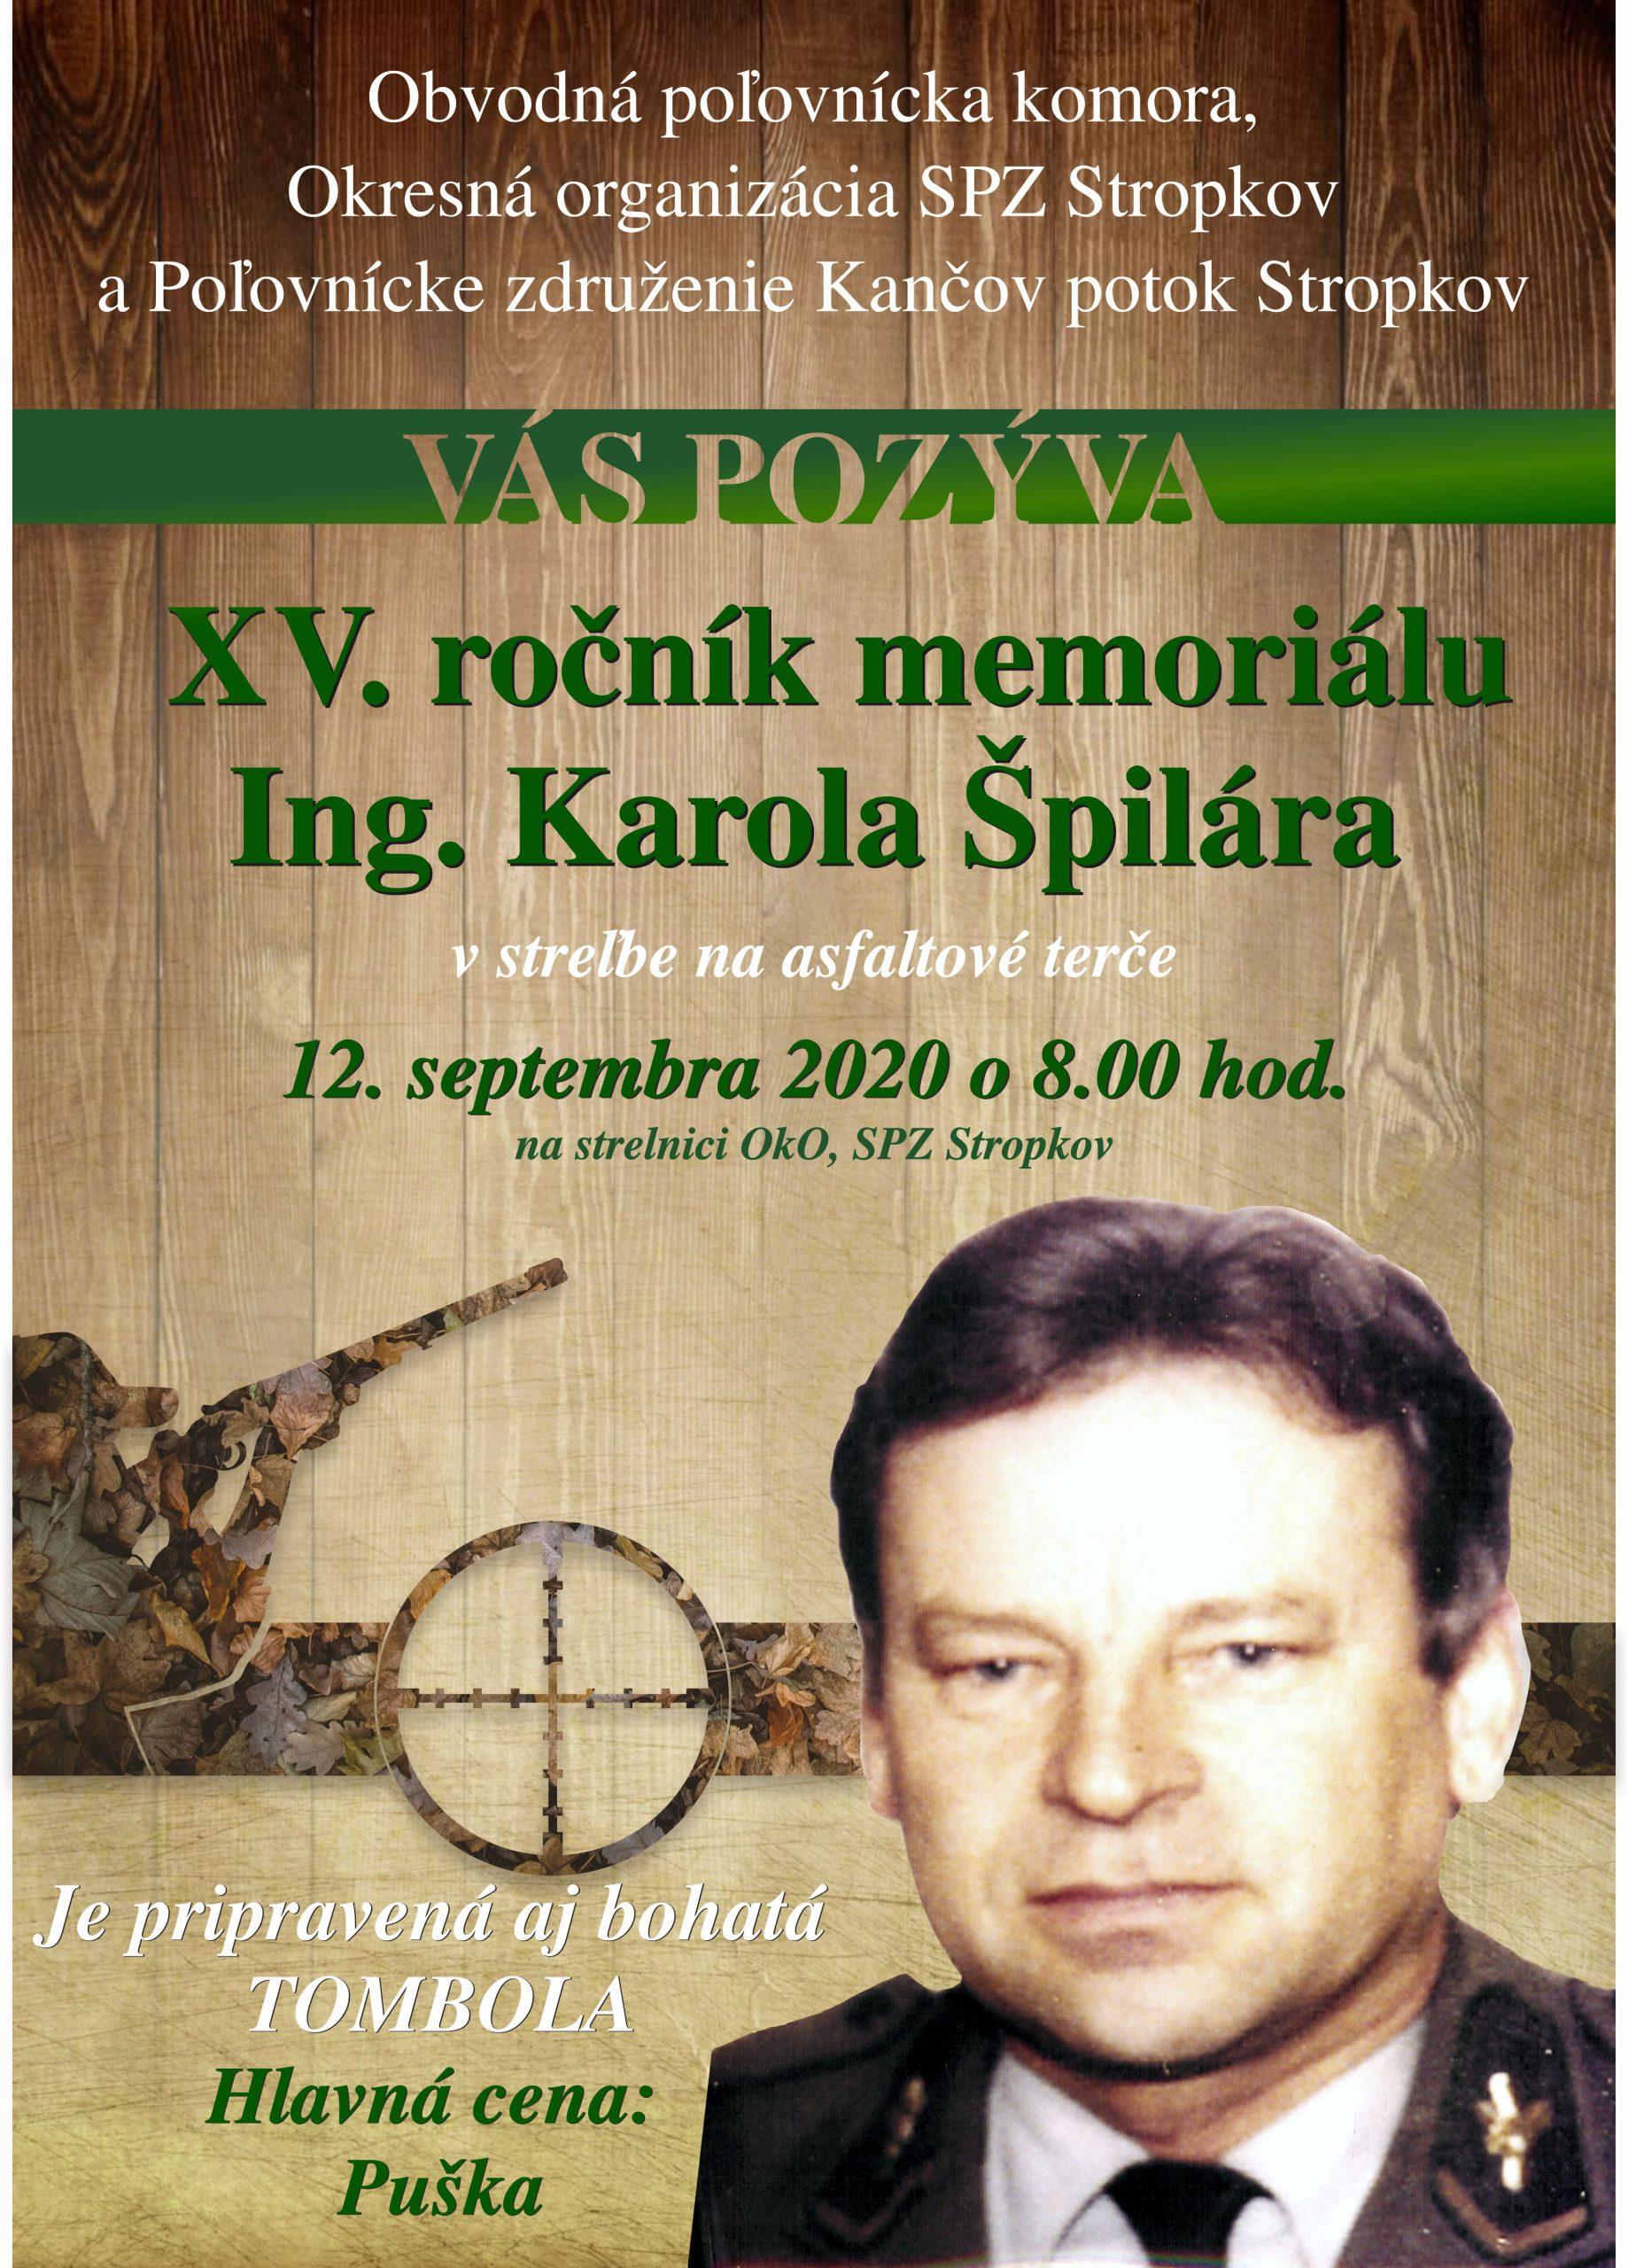 XV. ročník memoriálu Ing. Karola Špilára